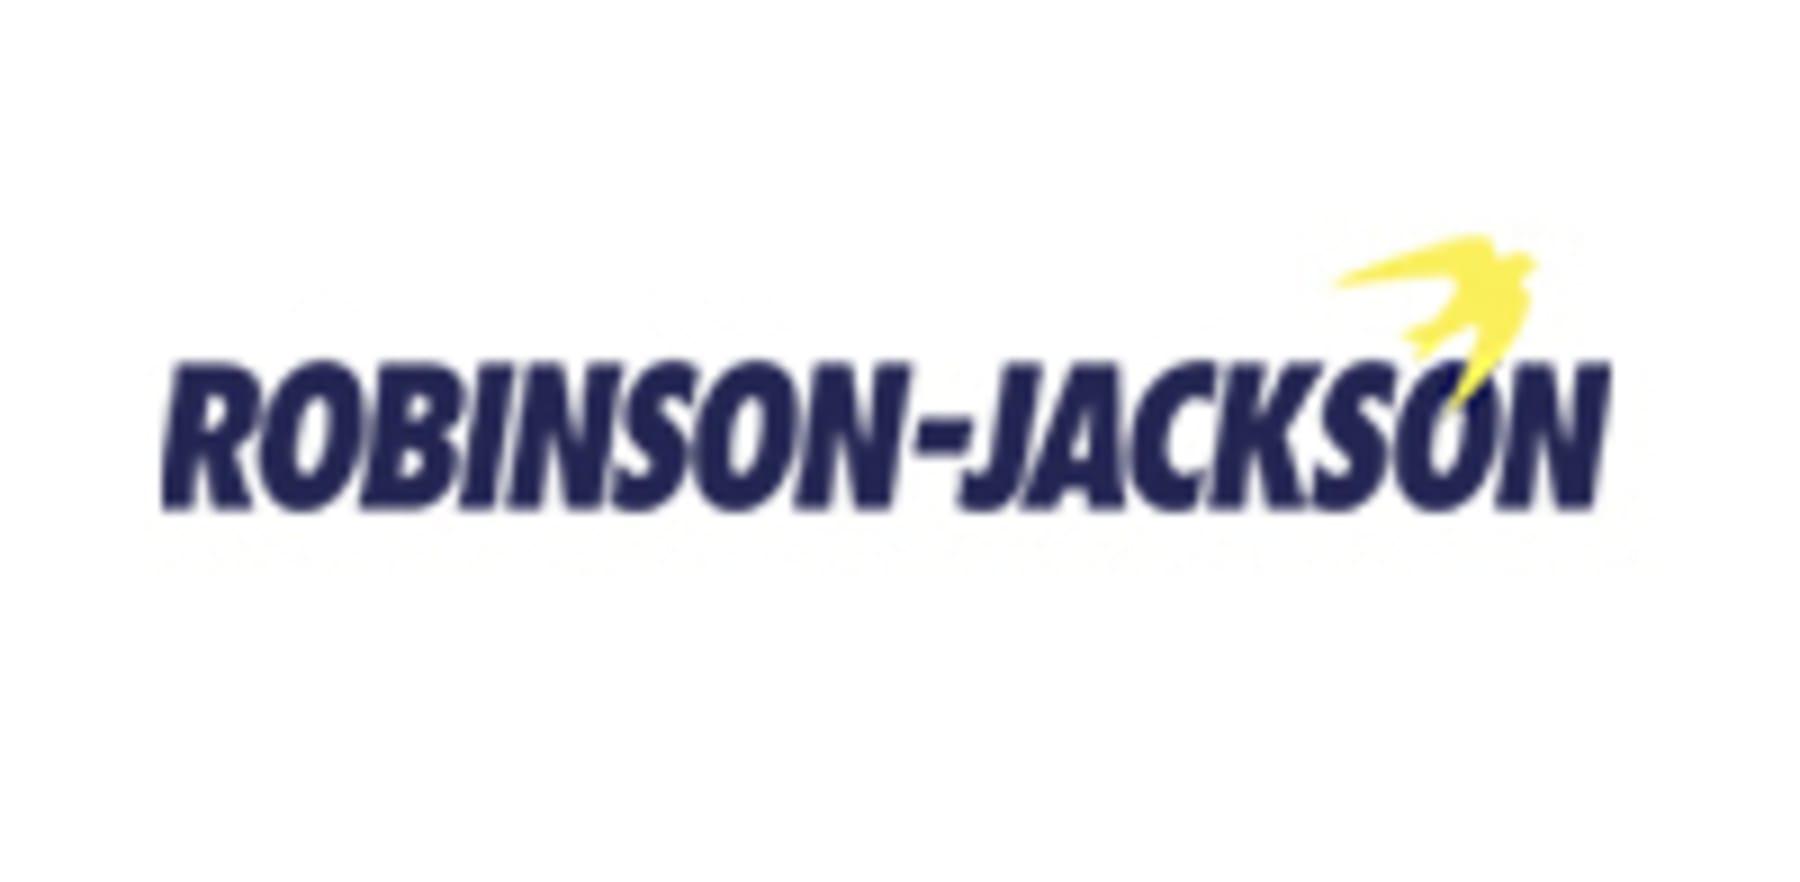 The Robinson-Jackson Group